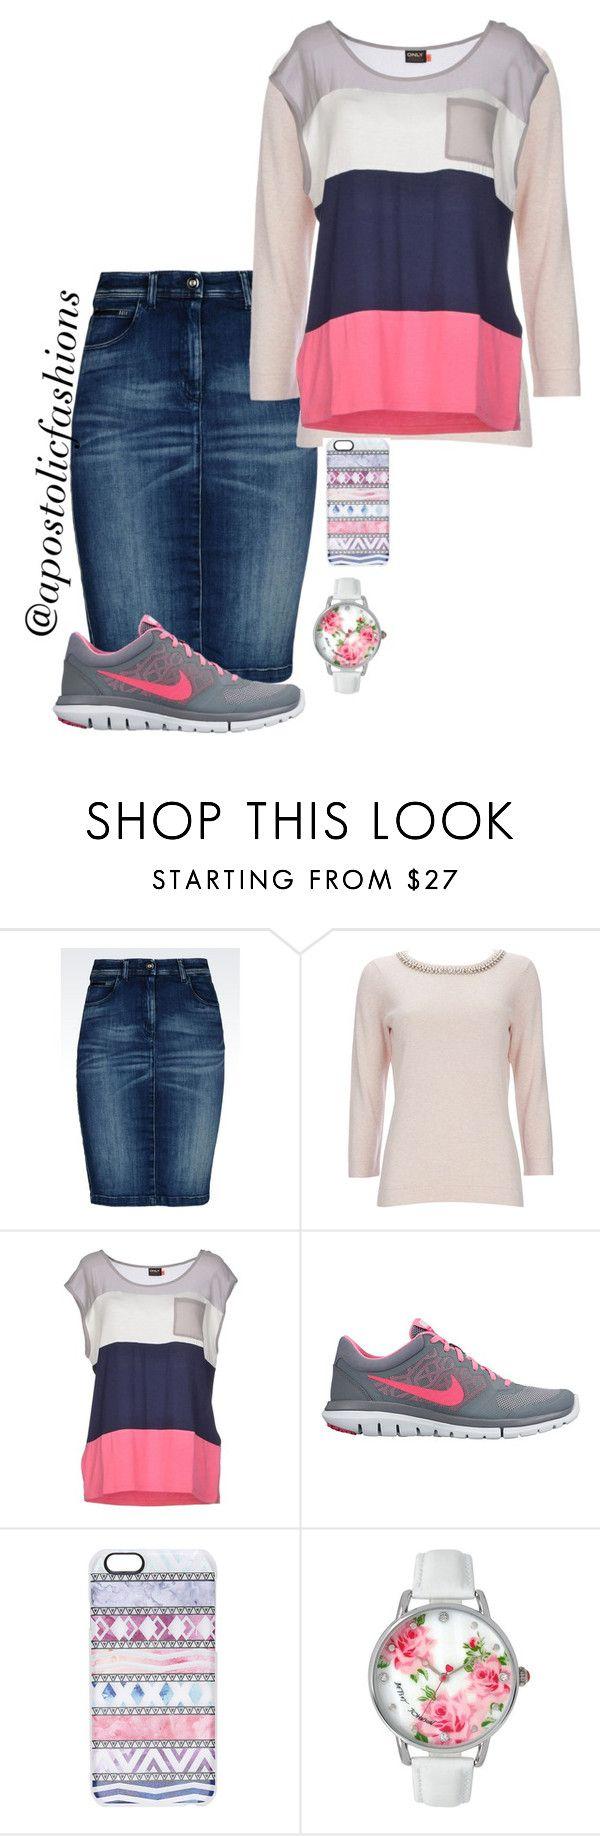 Hot New Styles! (windowshoponline.com)